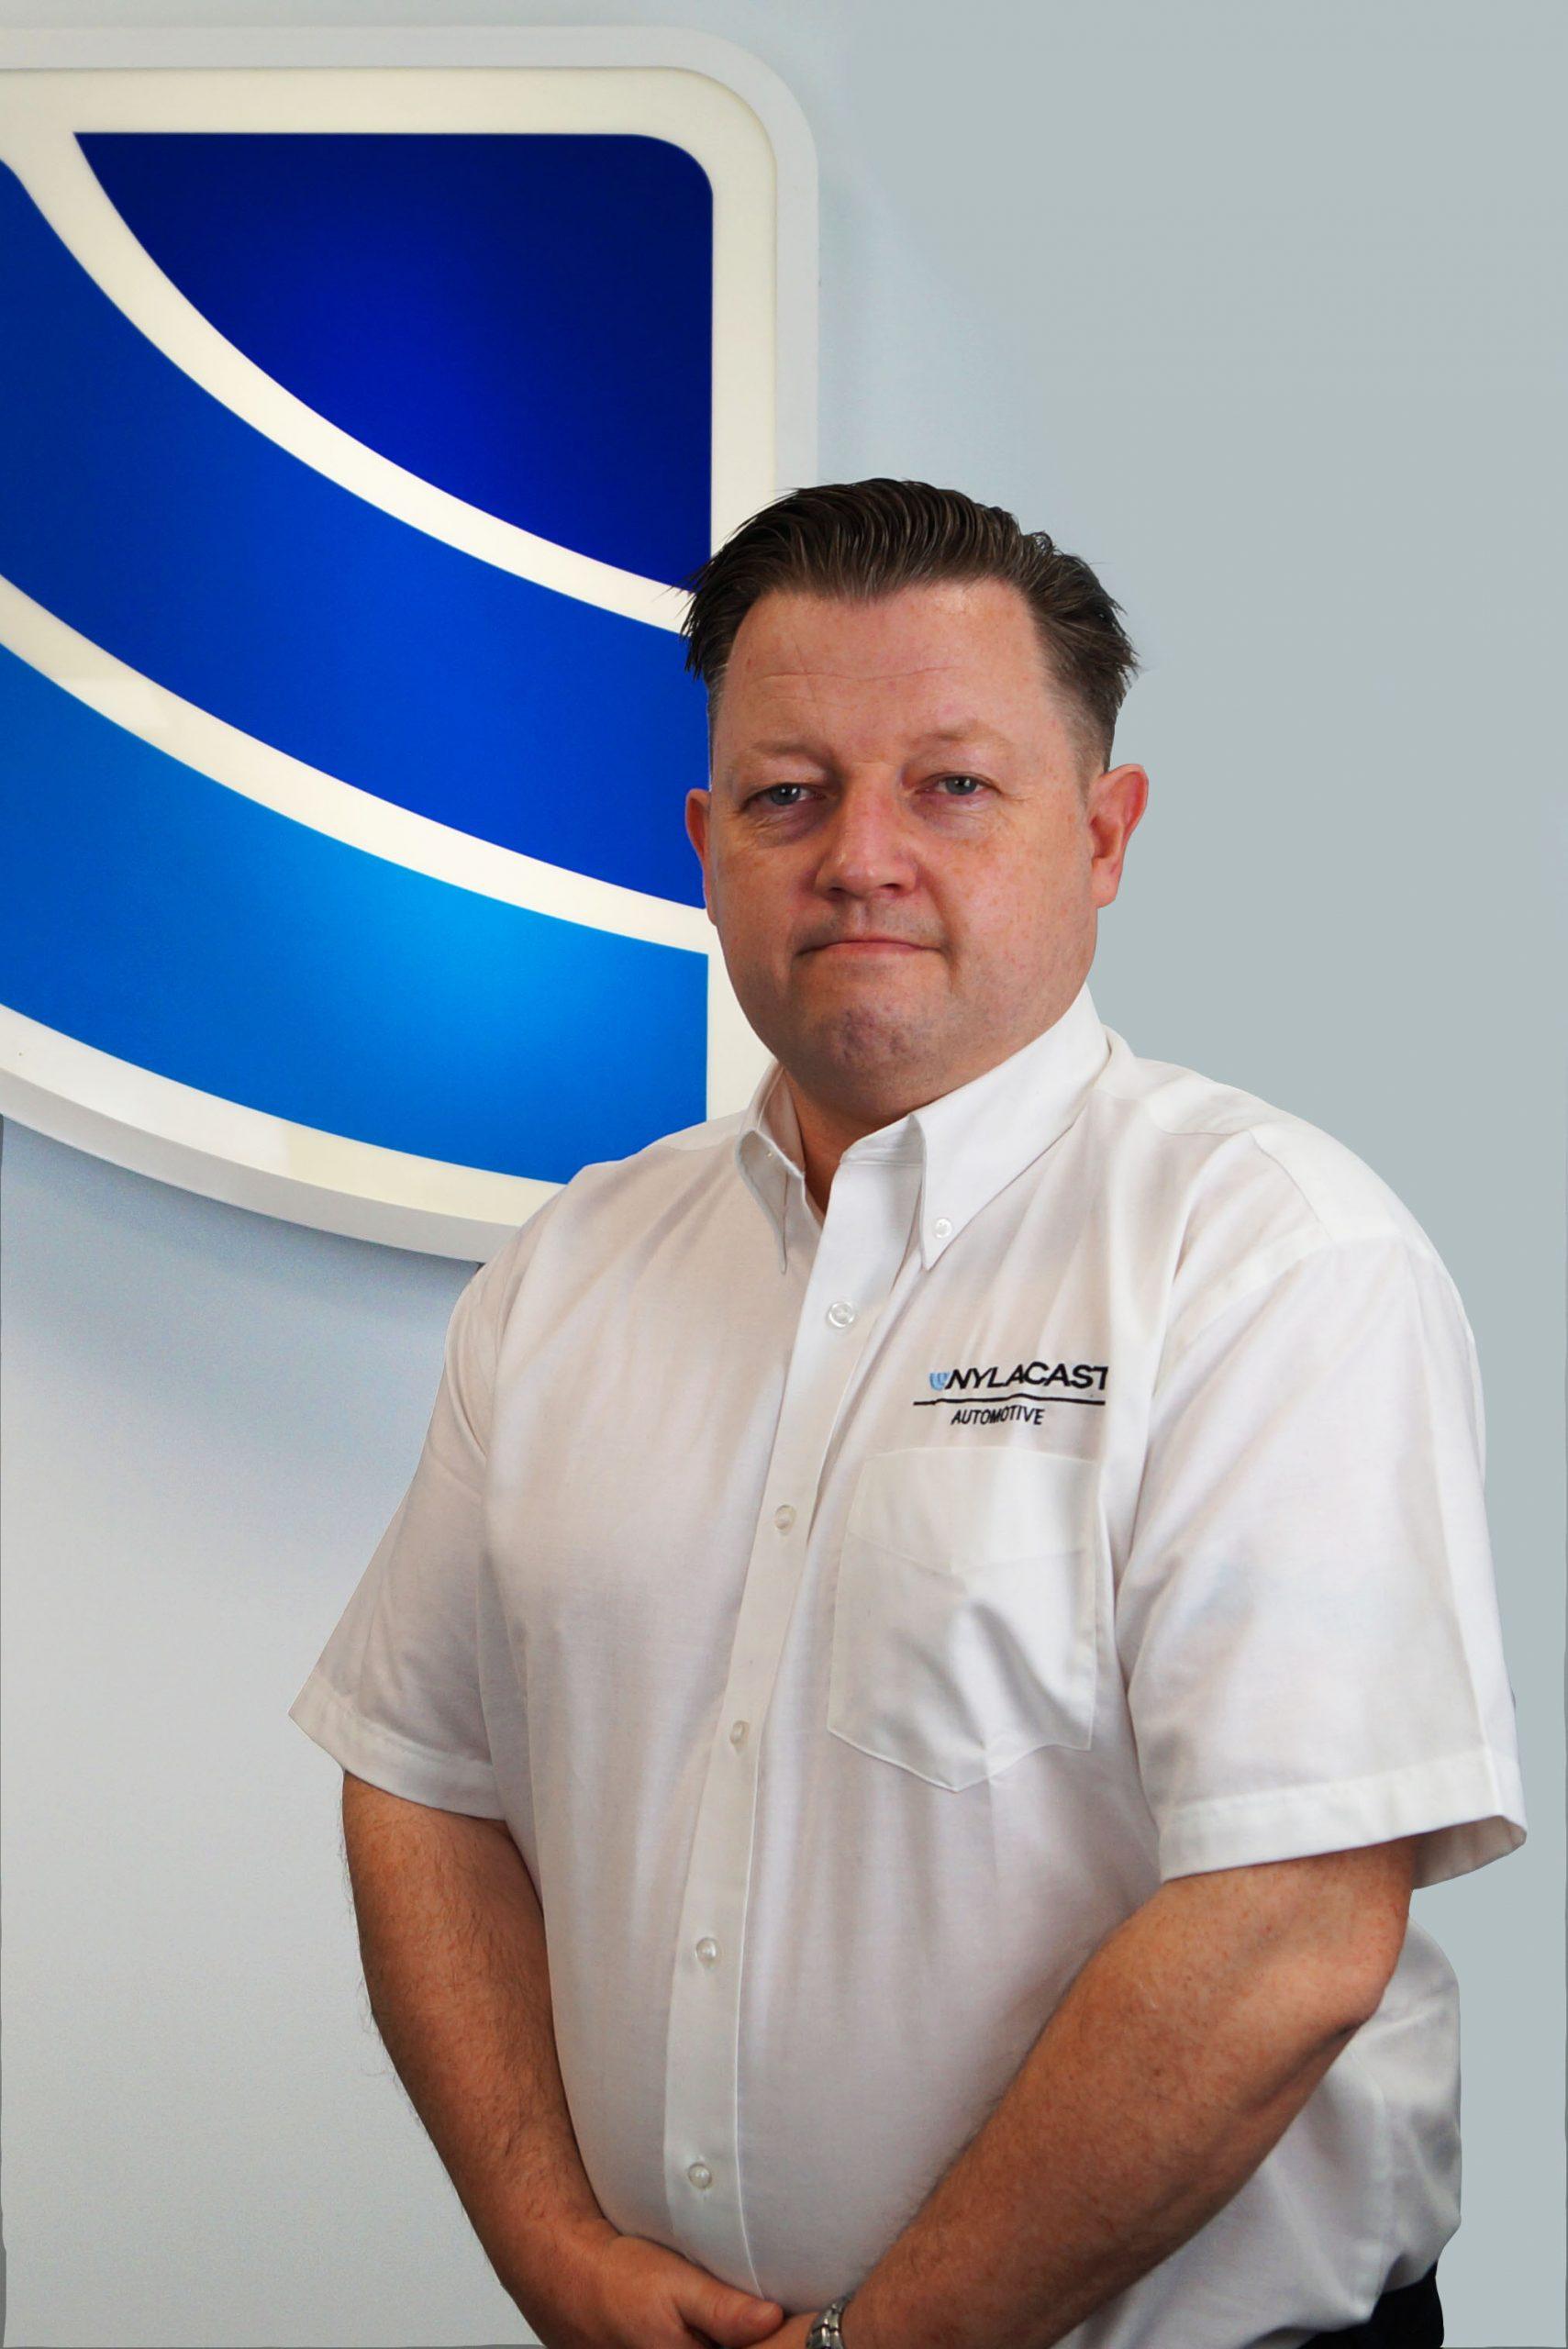 Pete Wignall